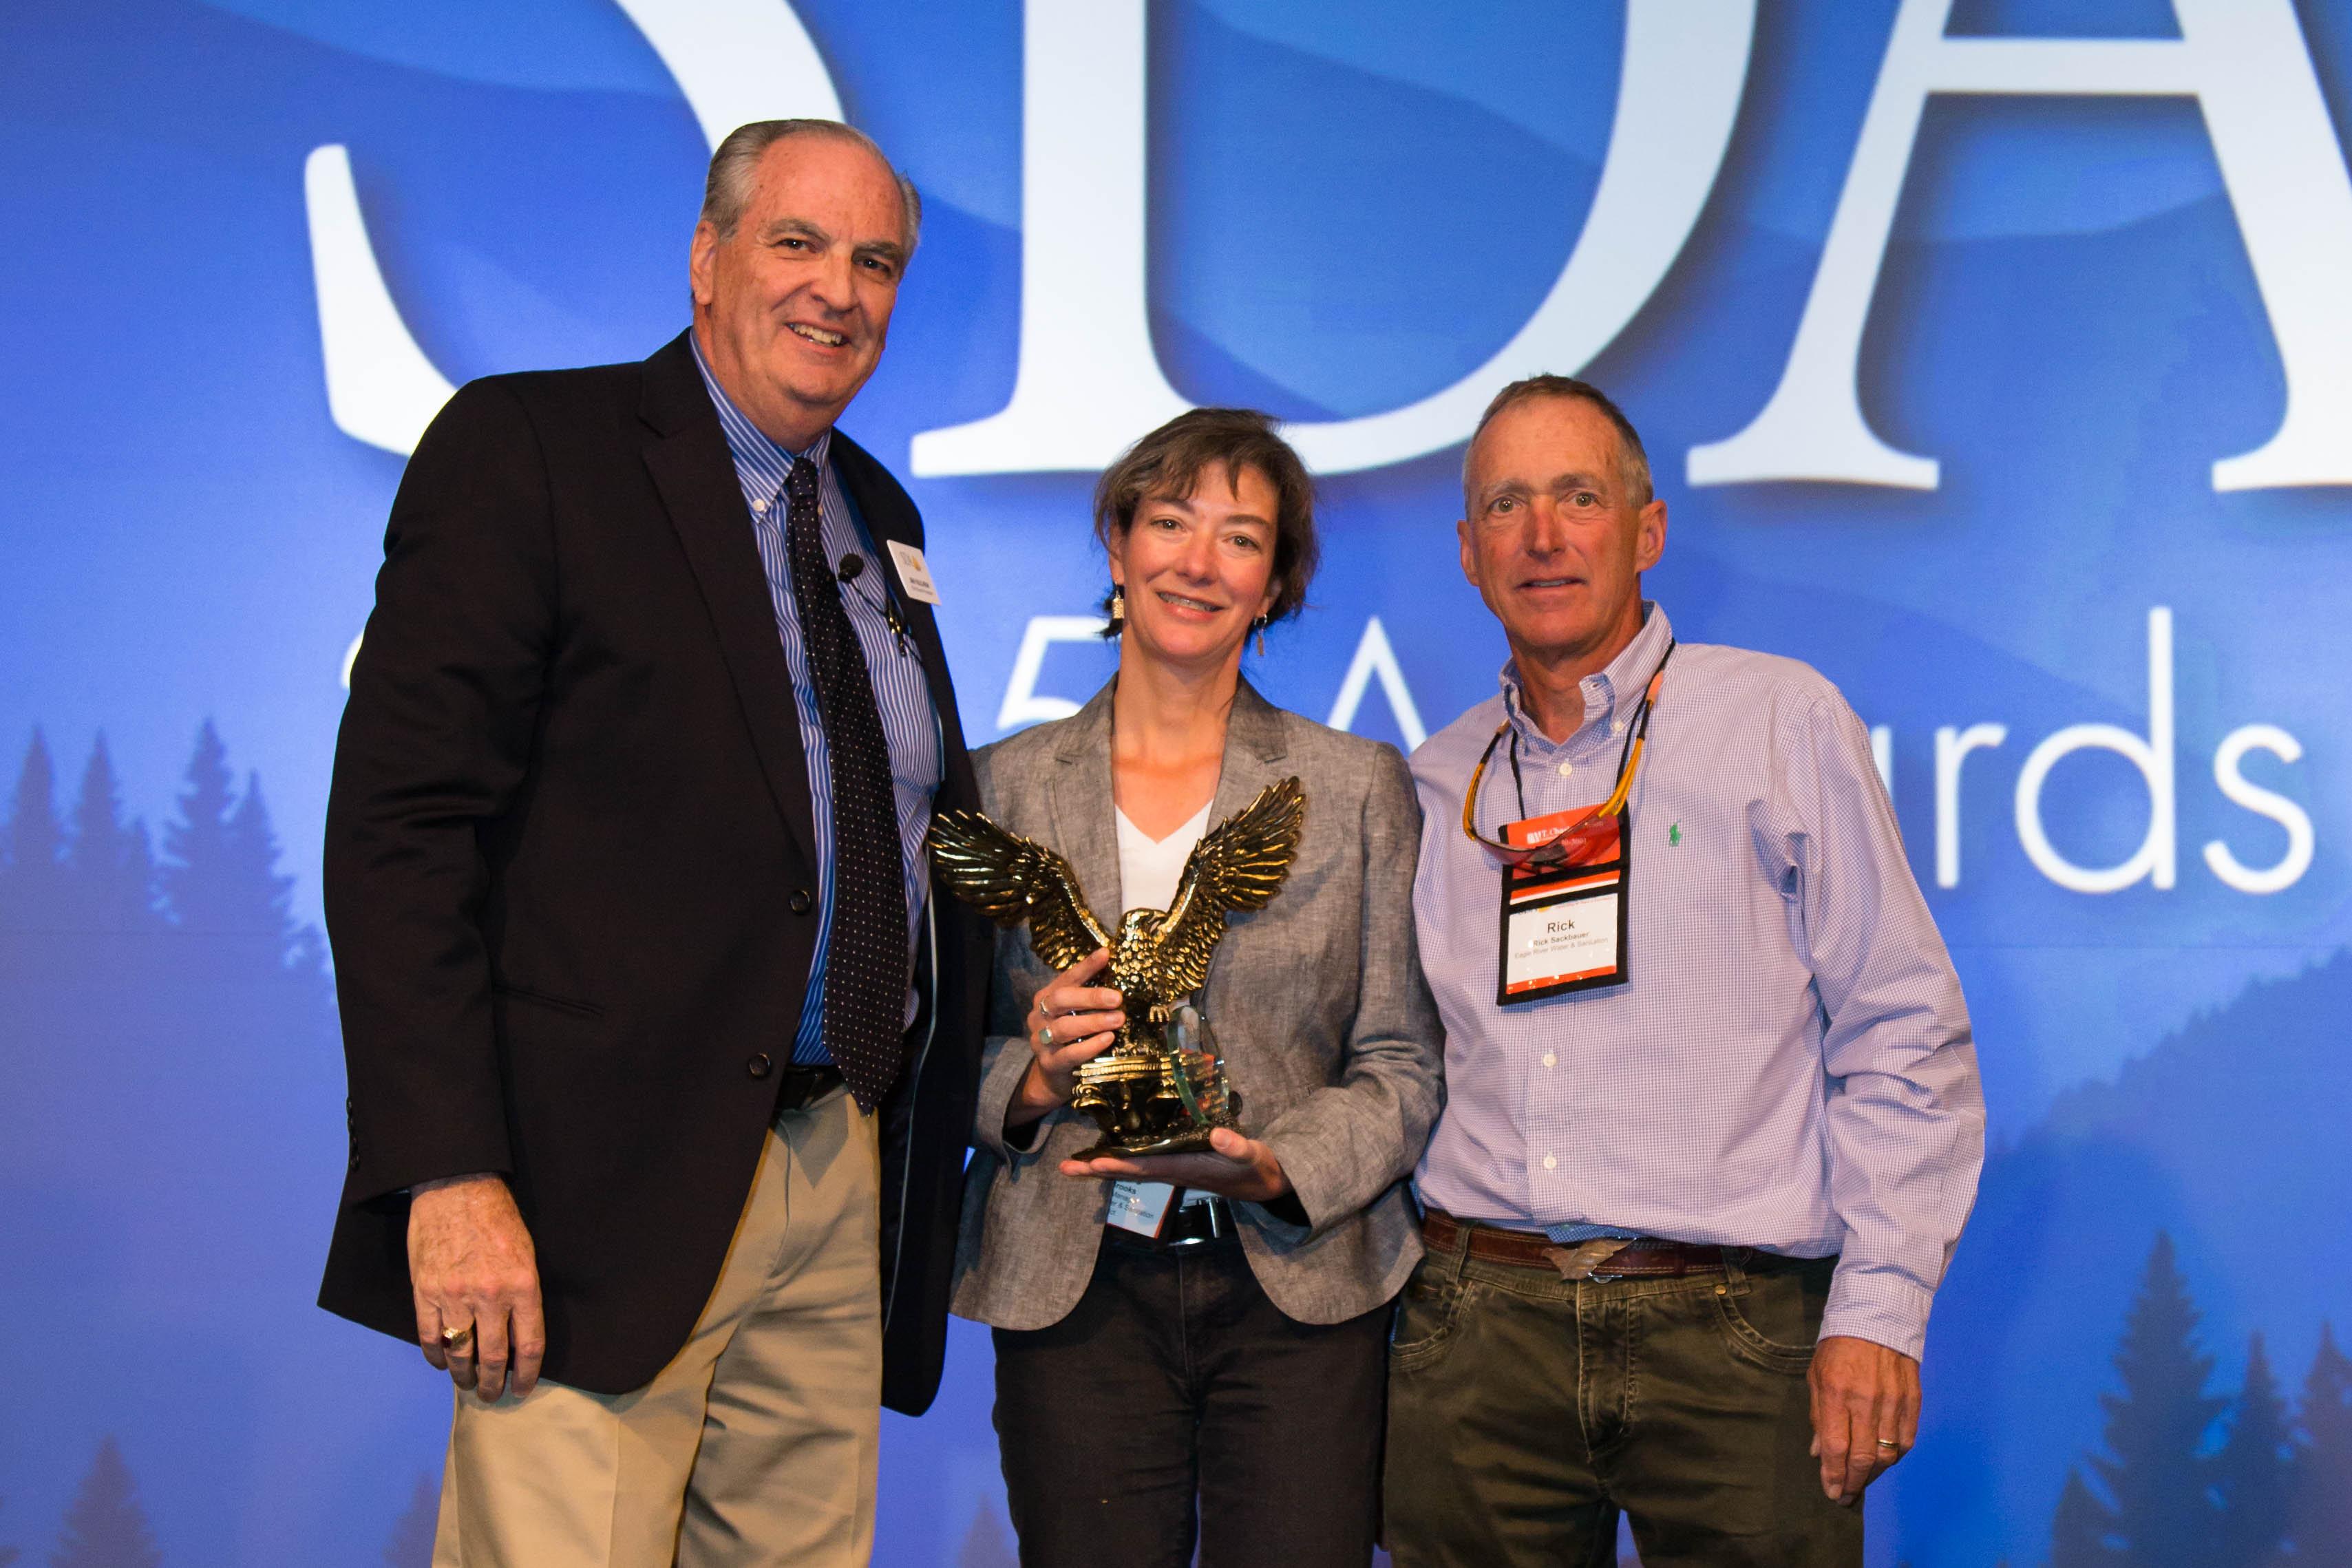 SDA District of the Year Award to ERWSD